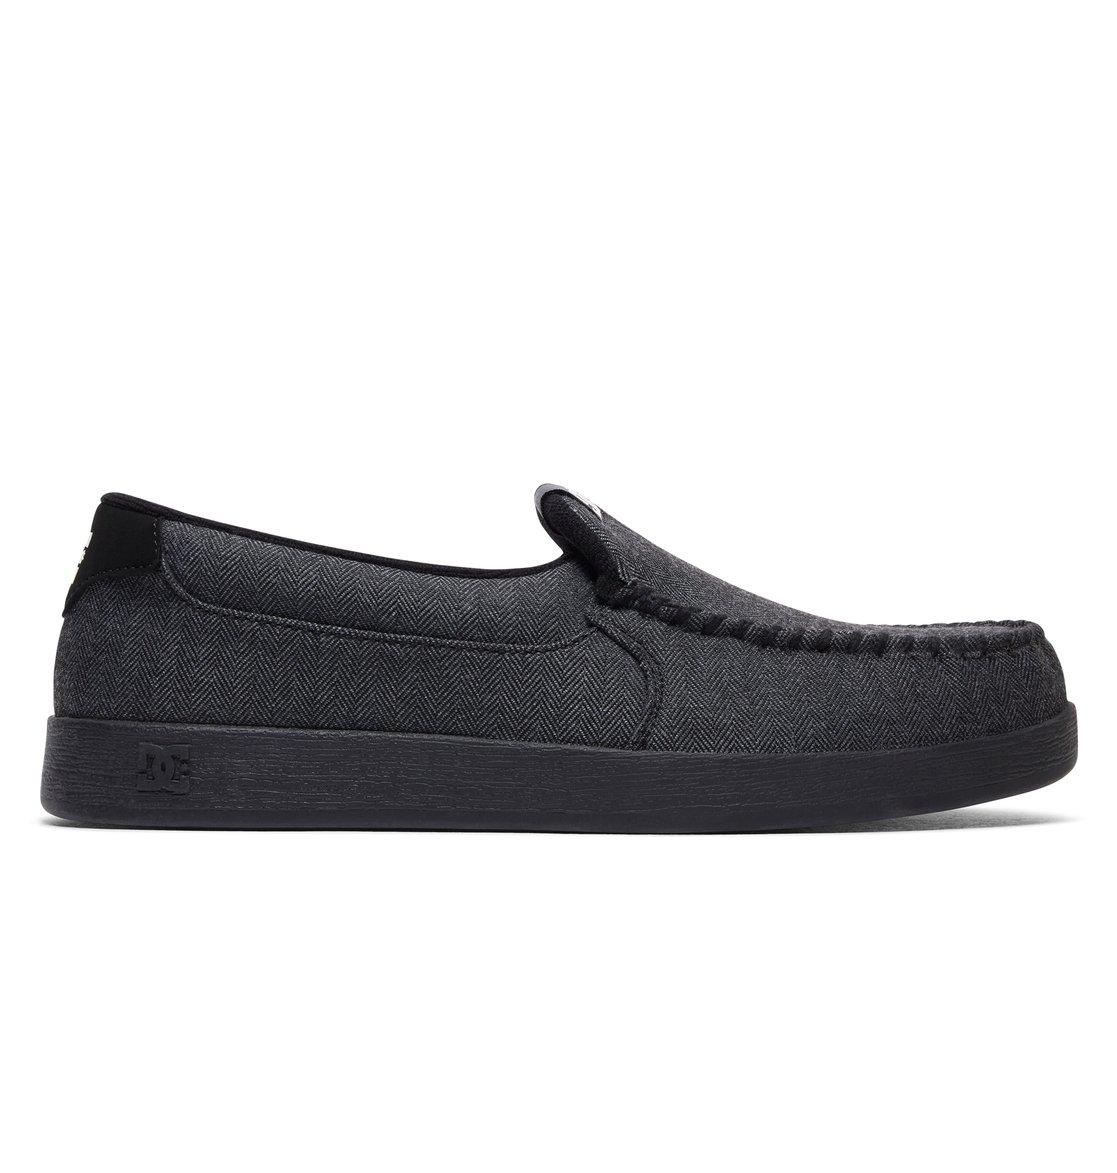 DC Shoes Men's Villain TX Slip on Low Top Shoes Gray White (GWH) 8.5